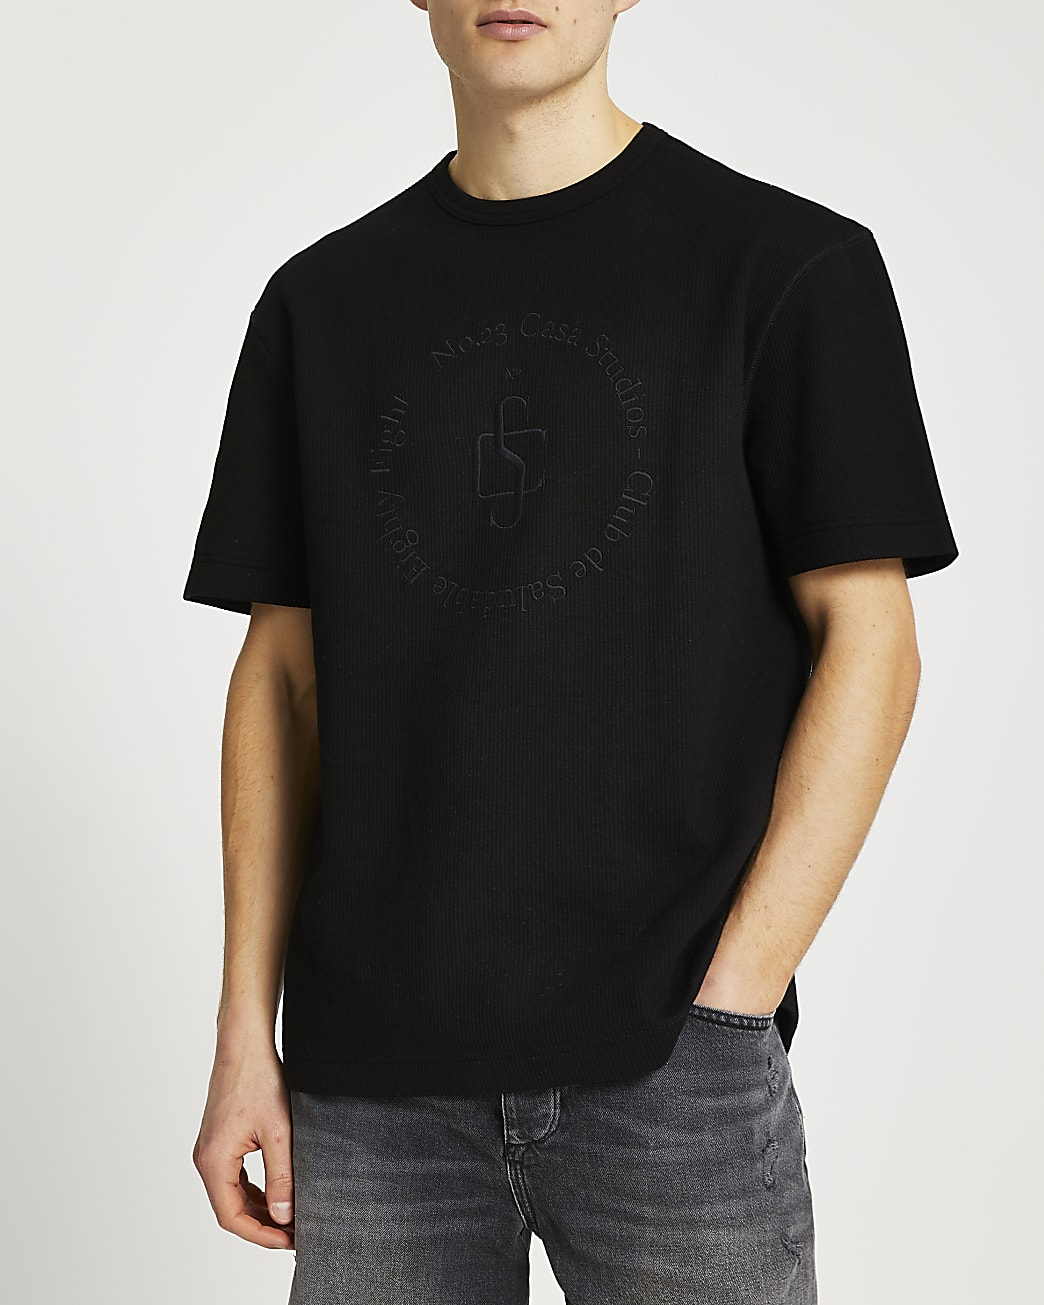 Black regular fit graphic ribbed t-shirt